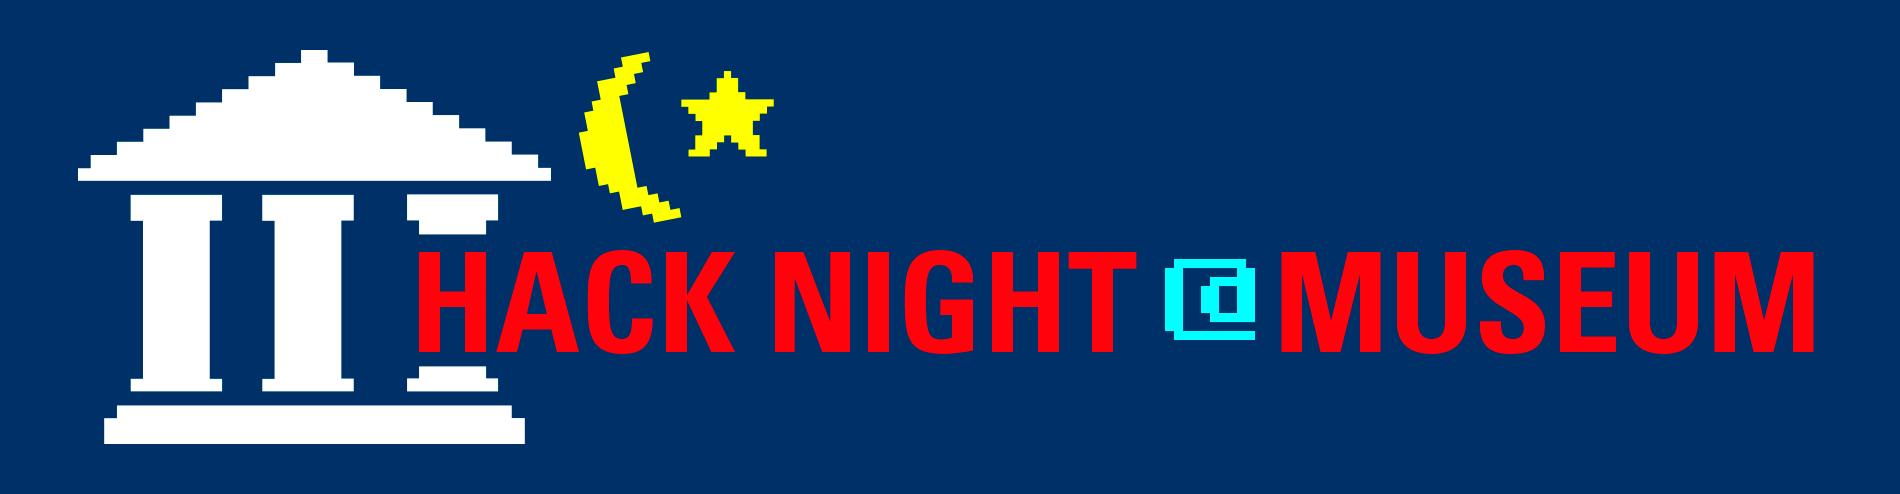 Hack Night at Museum